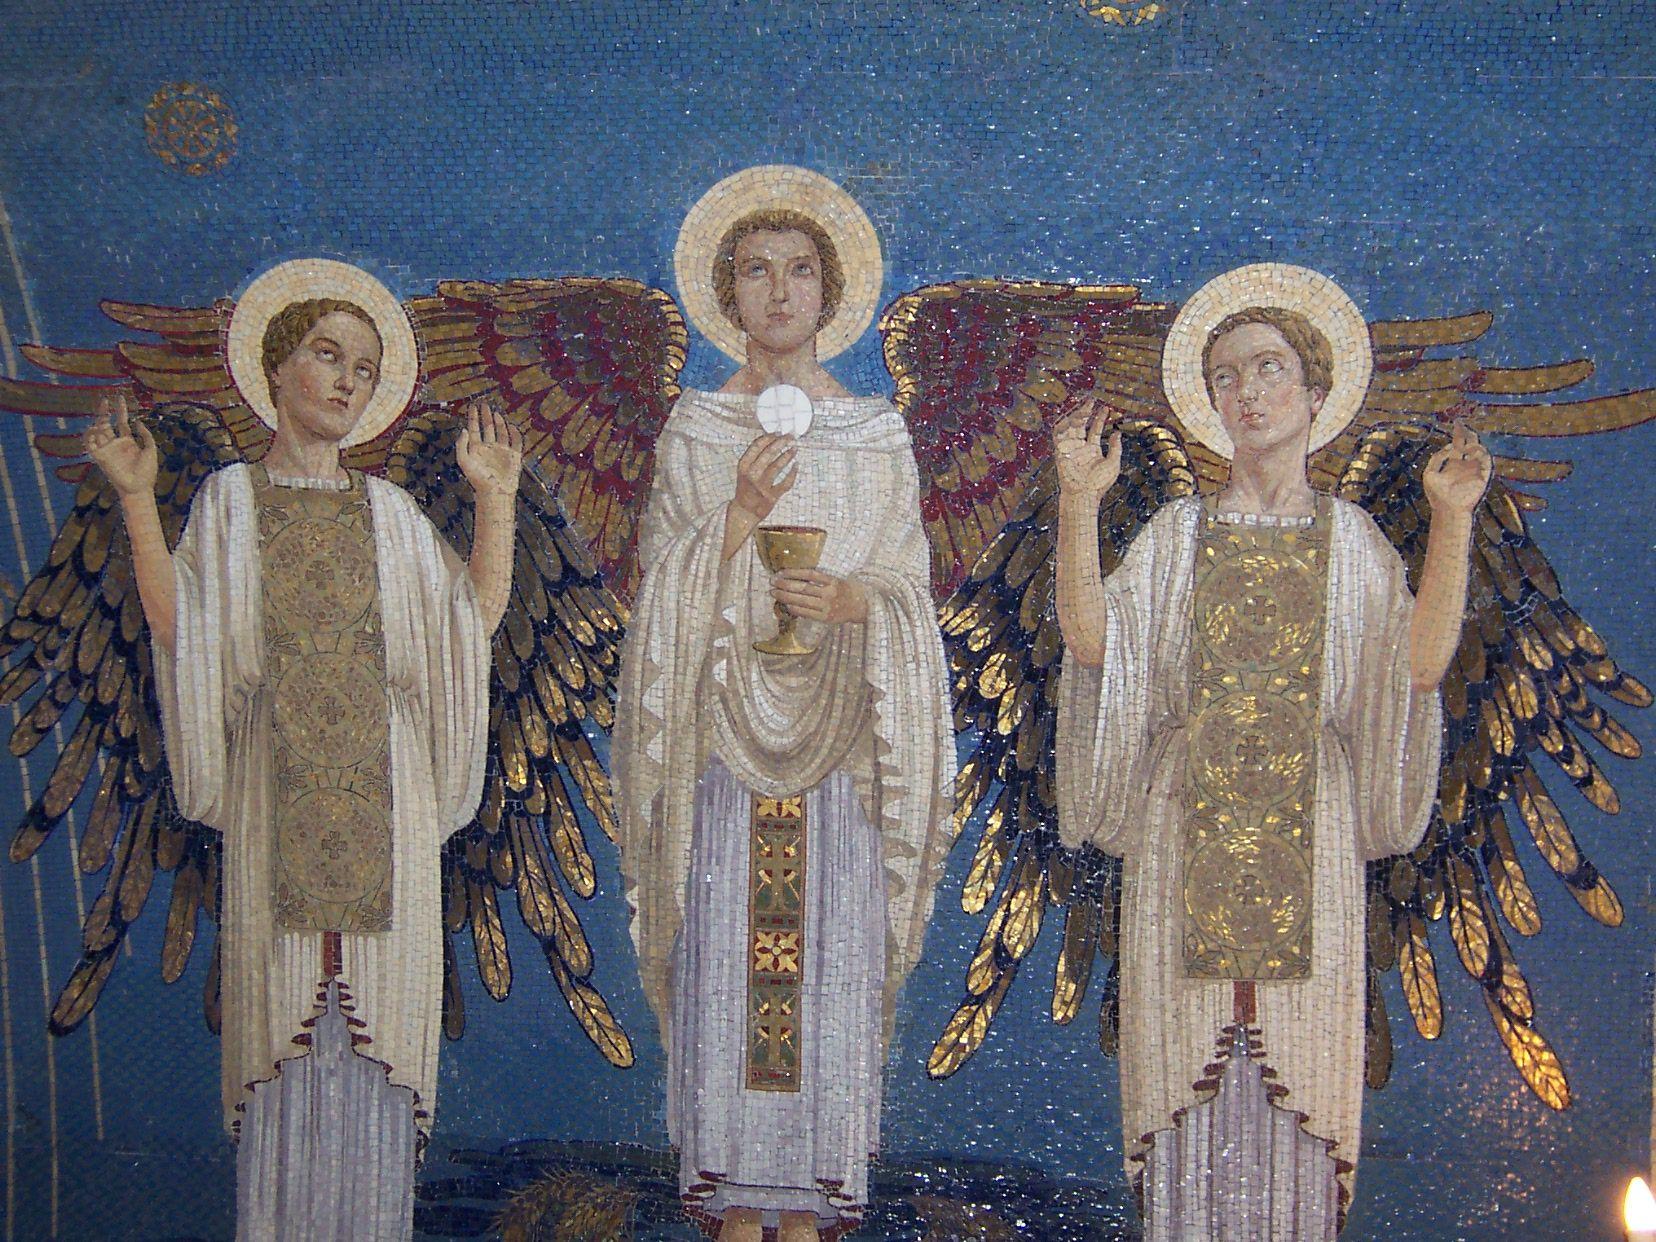 Mosaic at Church of Transfiguration, Mt. Tabor, Israel